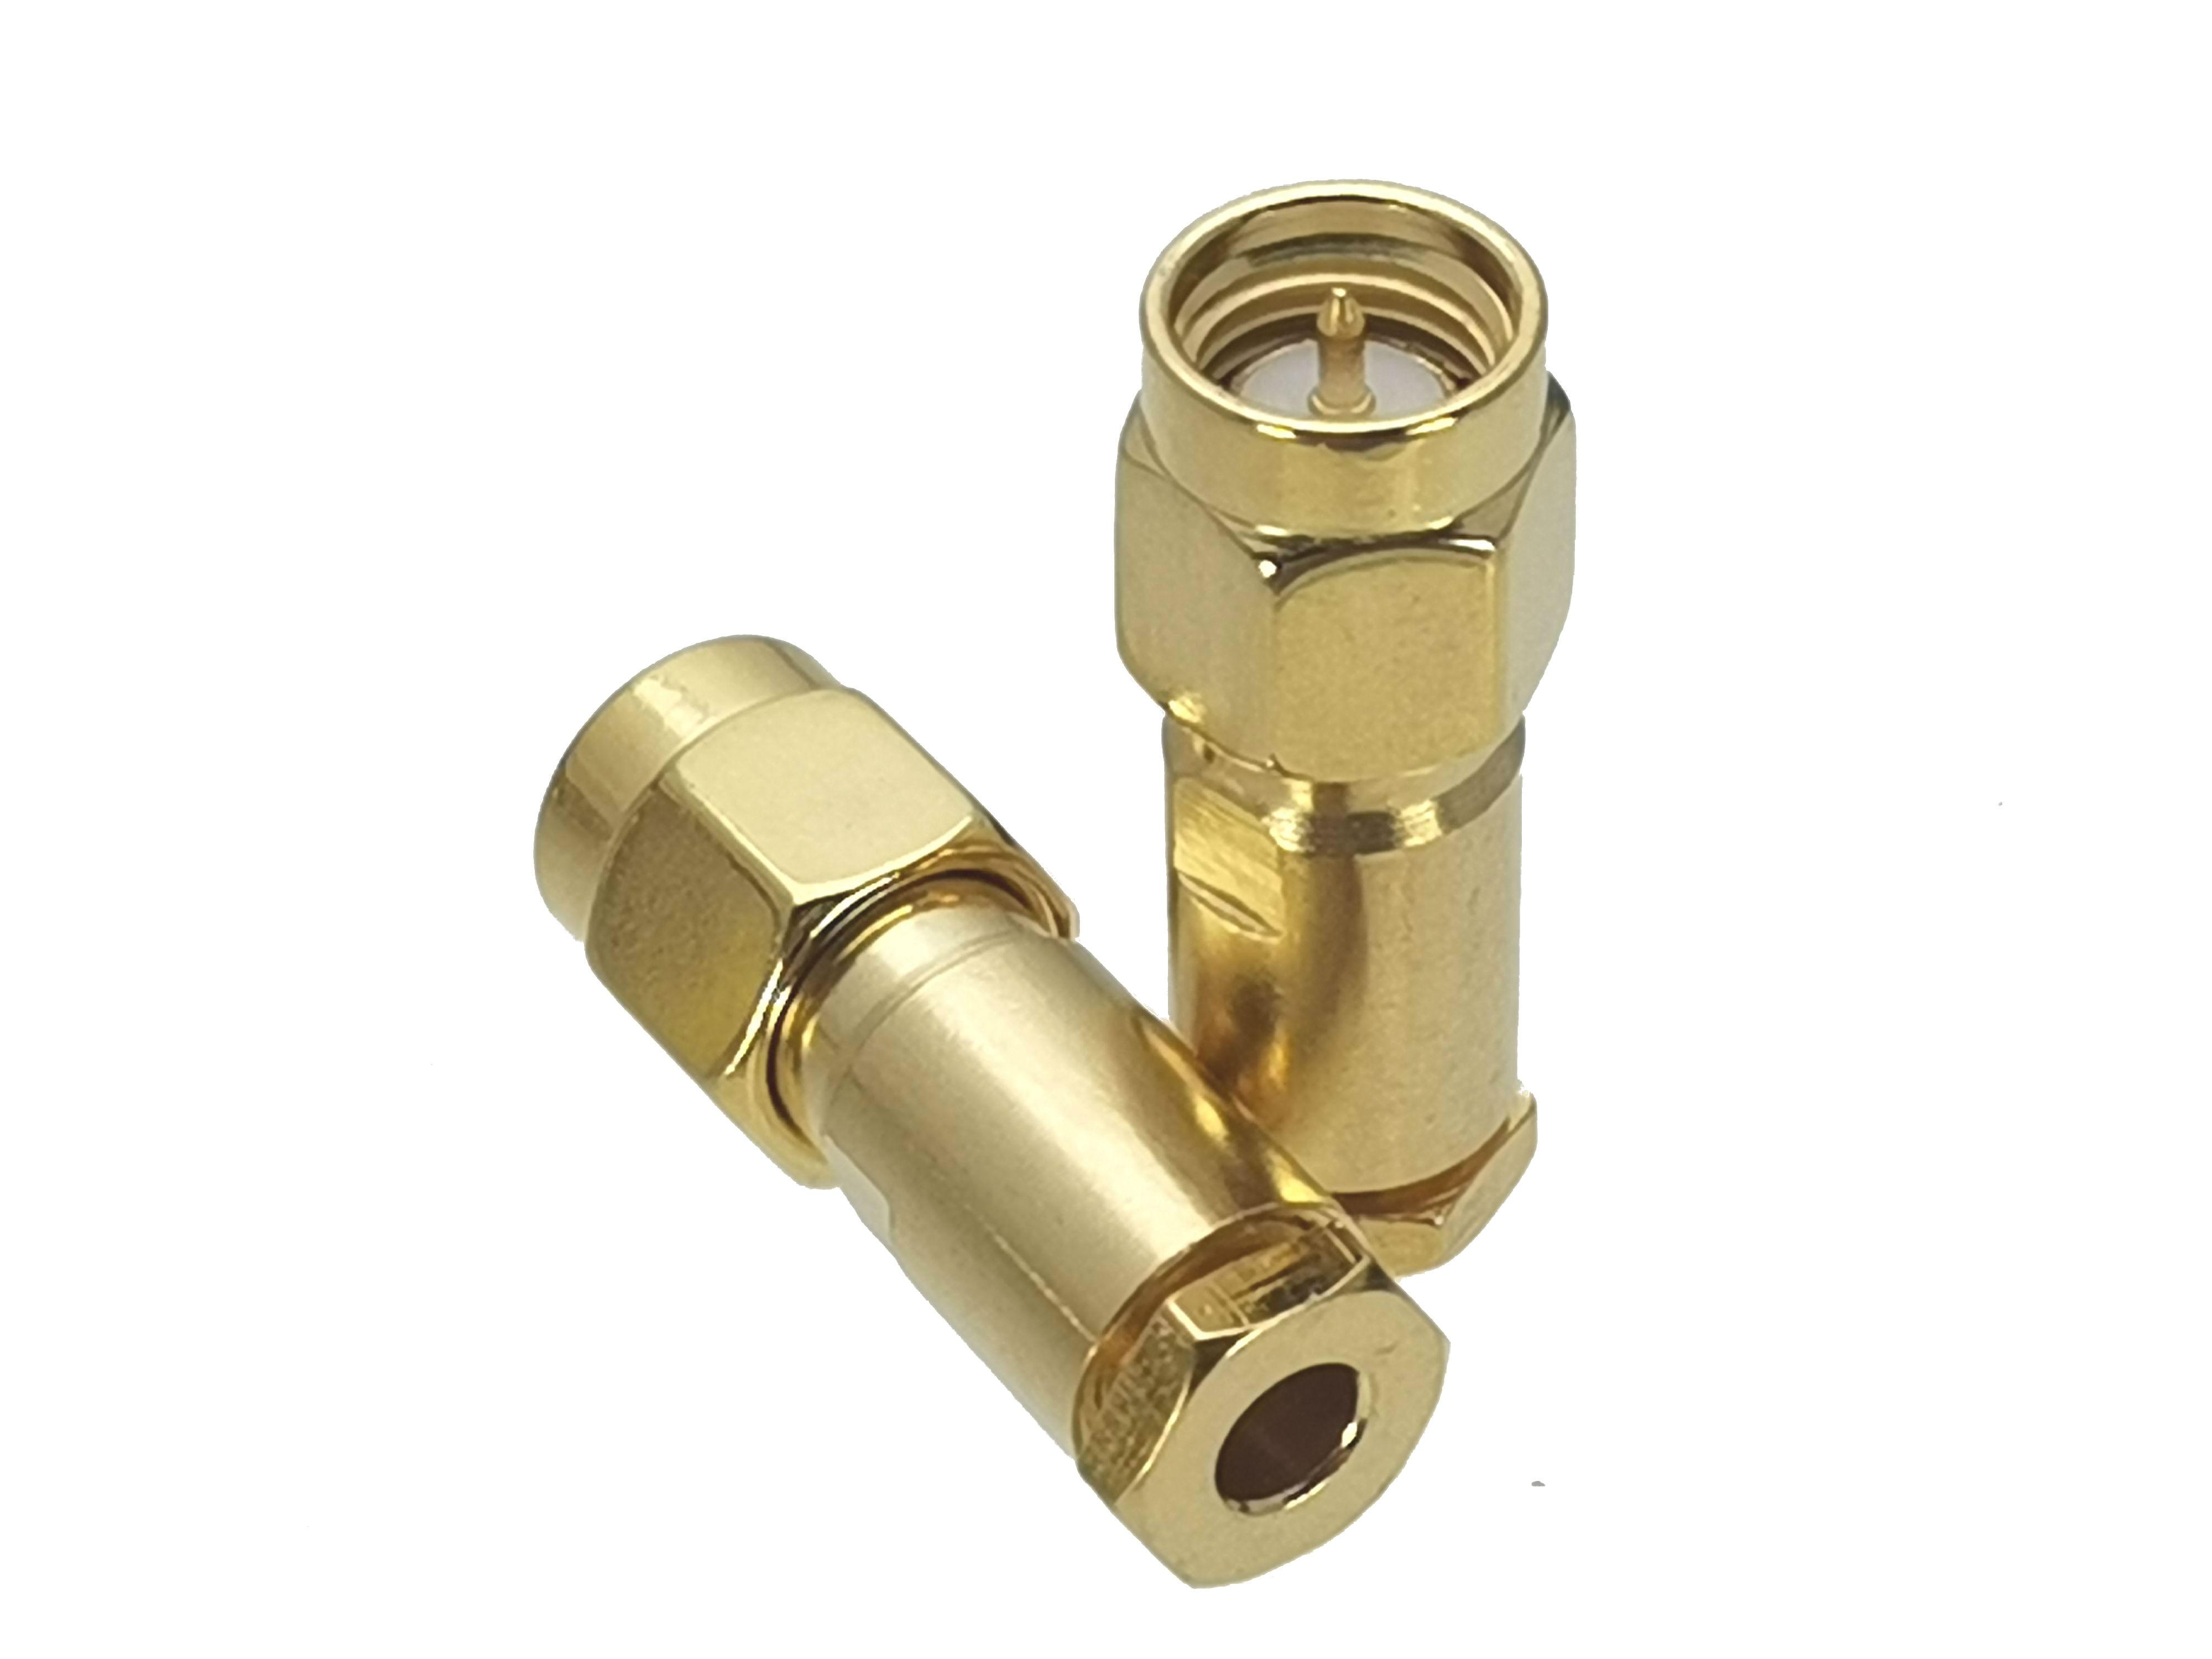 1Pcs Connector SMA Male Plug Clamp RG316 RG174 LMR100 RF Adapter Coaxial High Quanlity